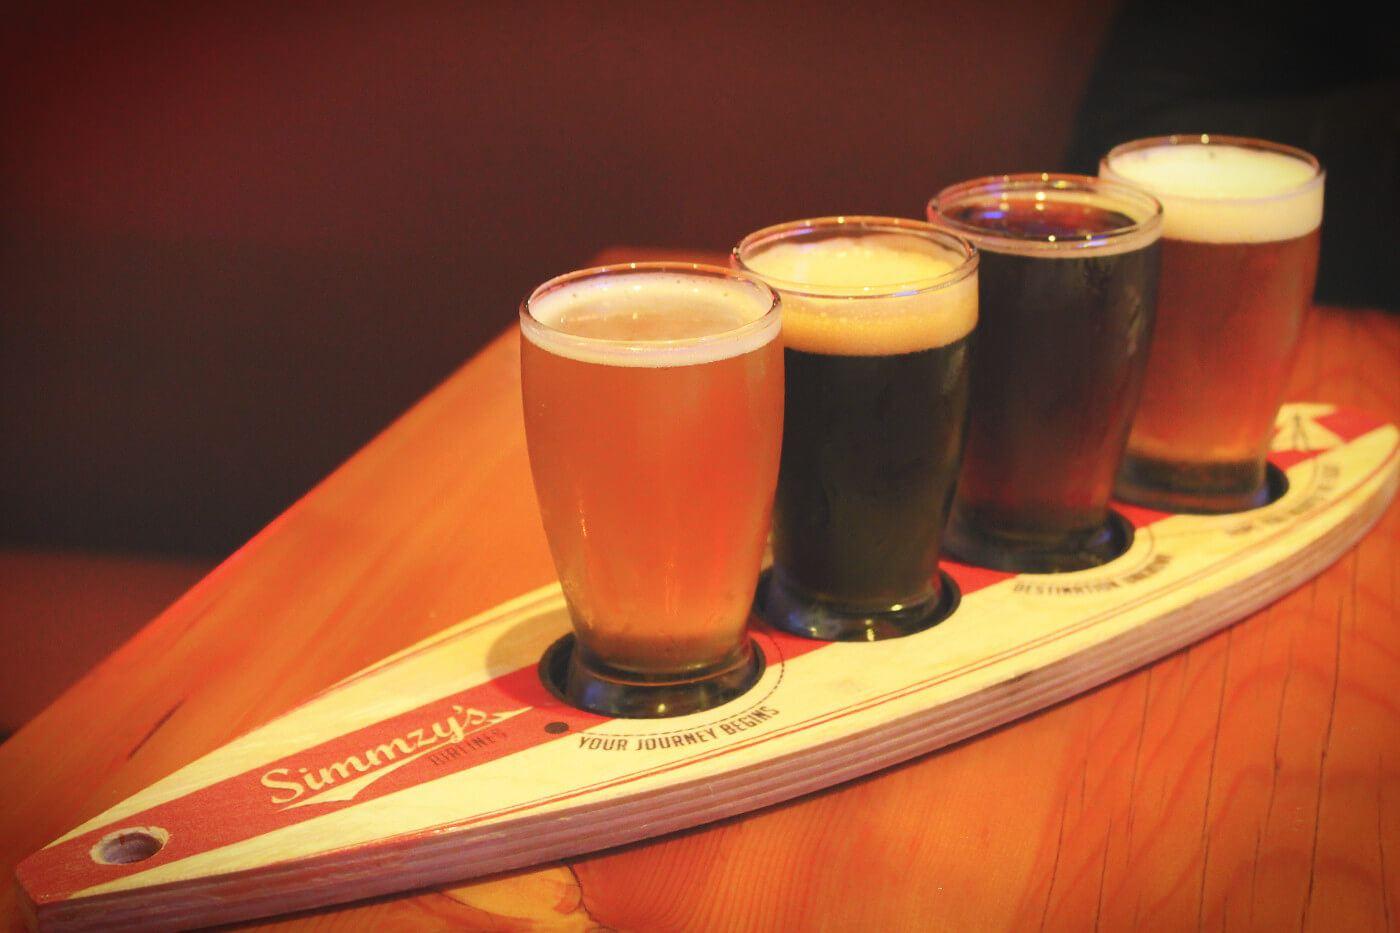 Simmzy's beer flight in Manhattan Beach, South Bay, Los Angeles, California.